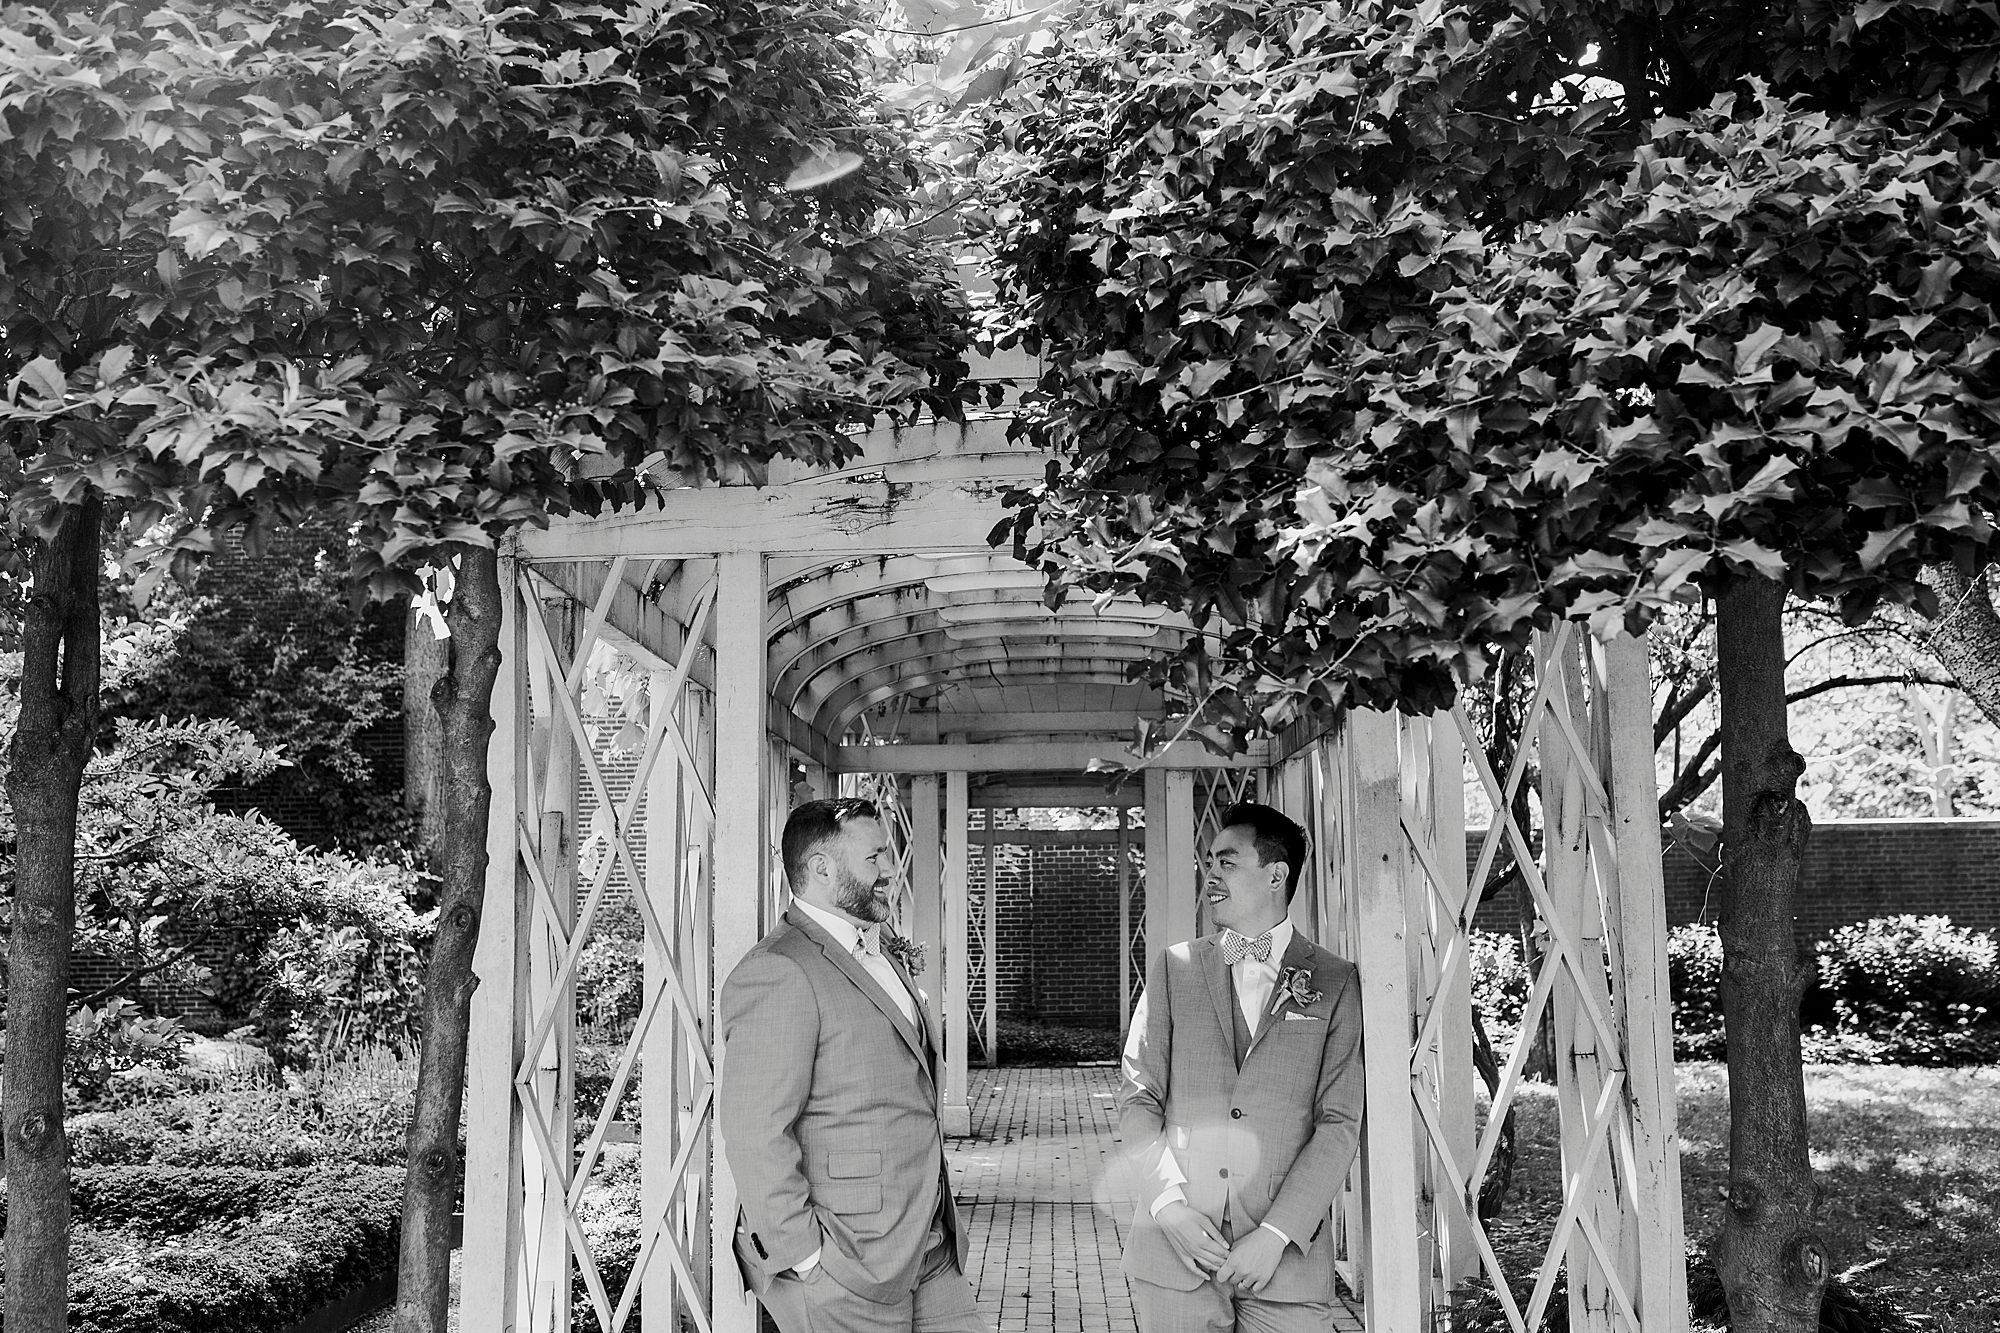 Dan_and_Byron_Love_by_Joe_Mac_Philadelphia_Wedding_LGBTQ_Photography_Gay_Independence_visitor_Center_40.JPG